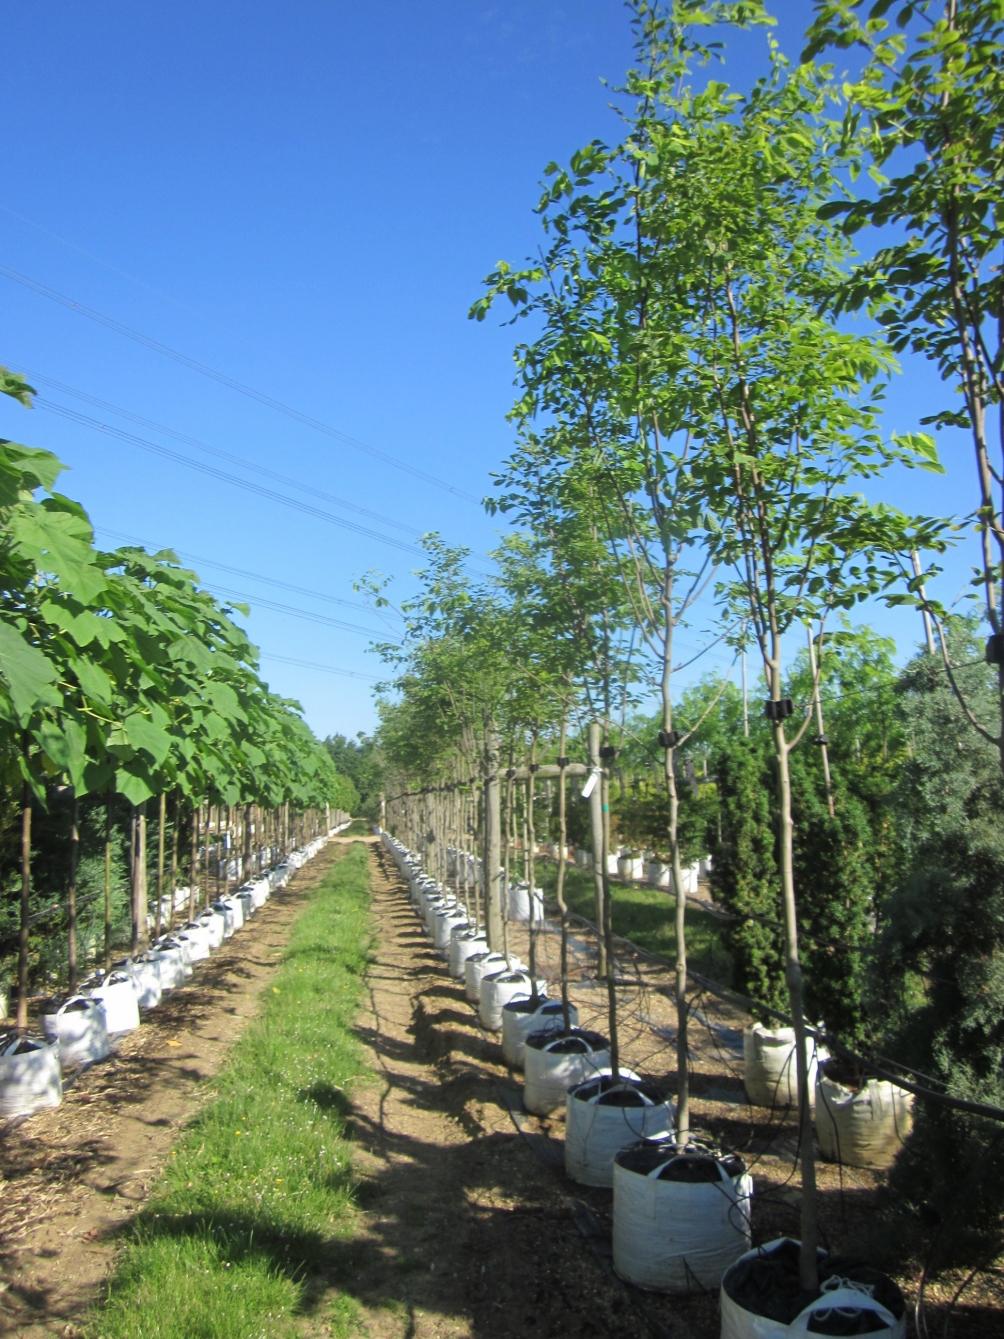 Cladrastis kentukea at barcham trees